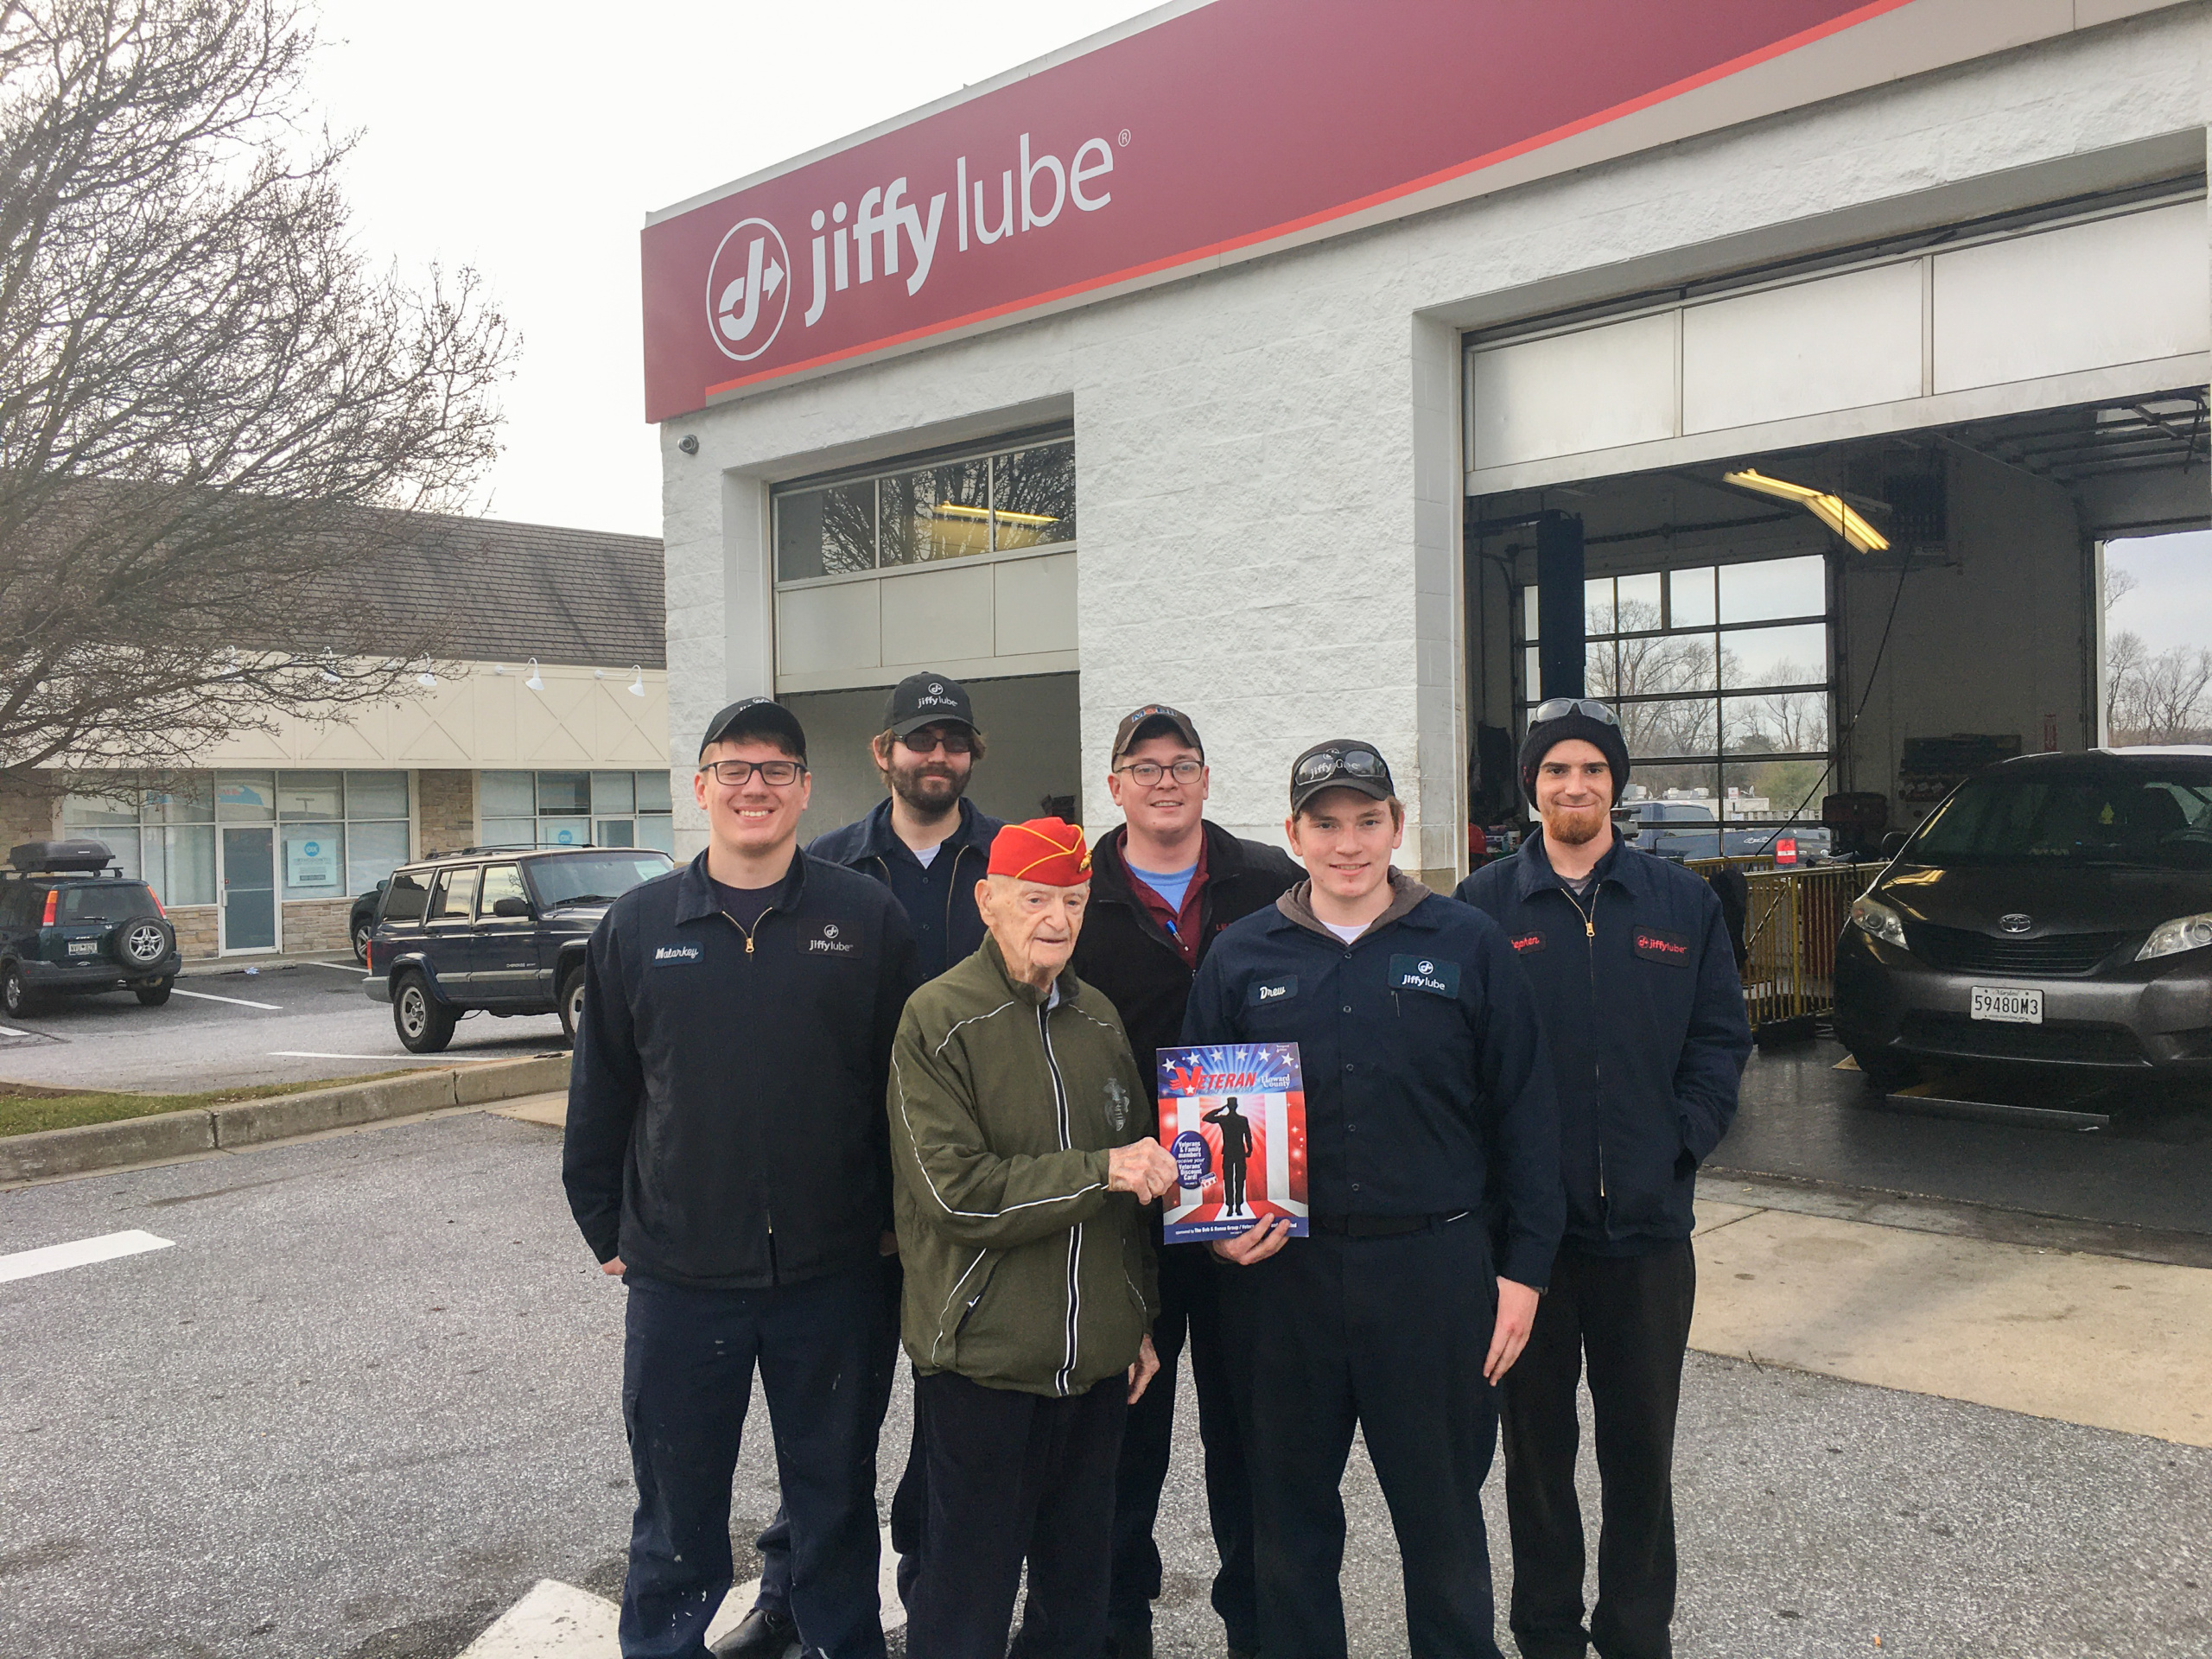 Jiffy Lube Clarksville